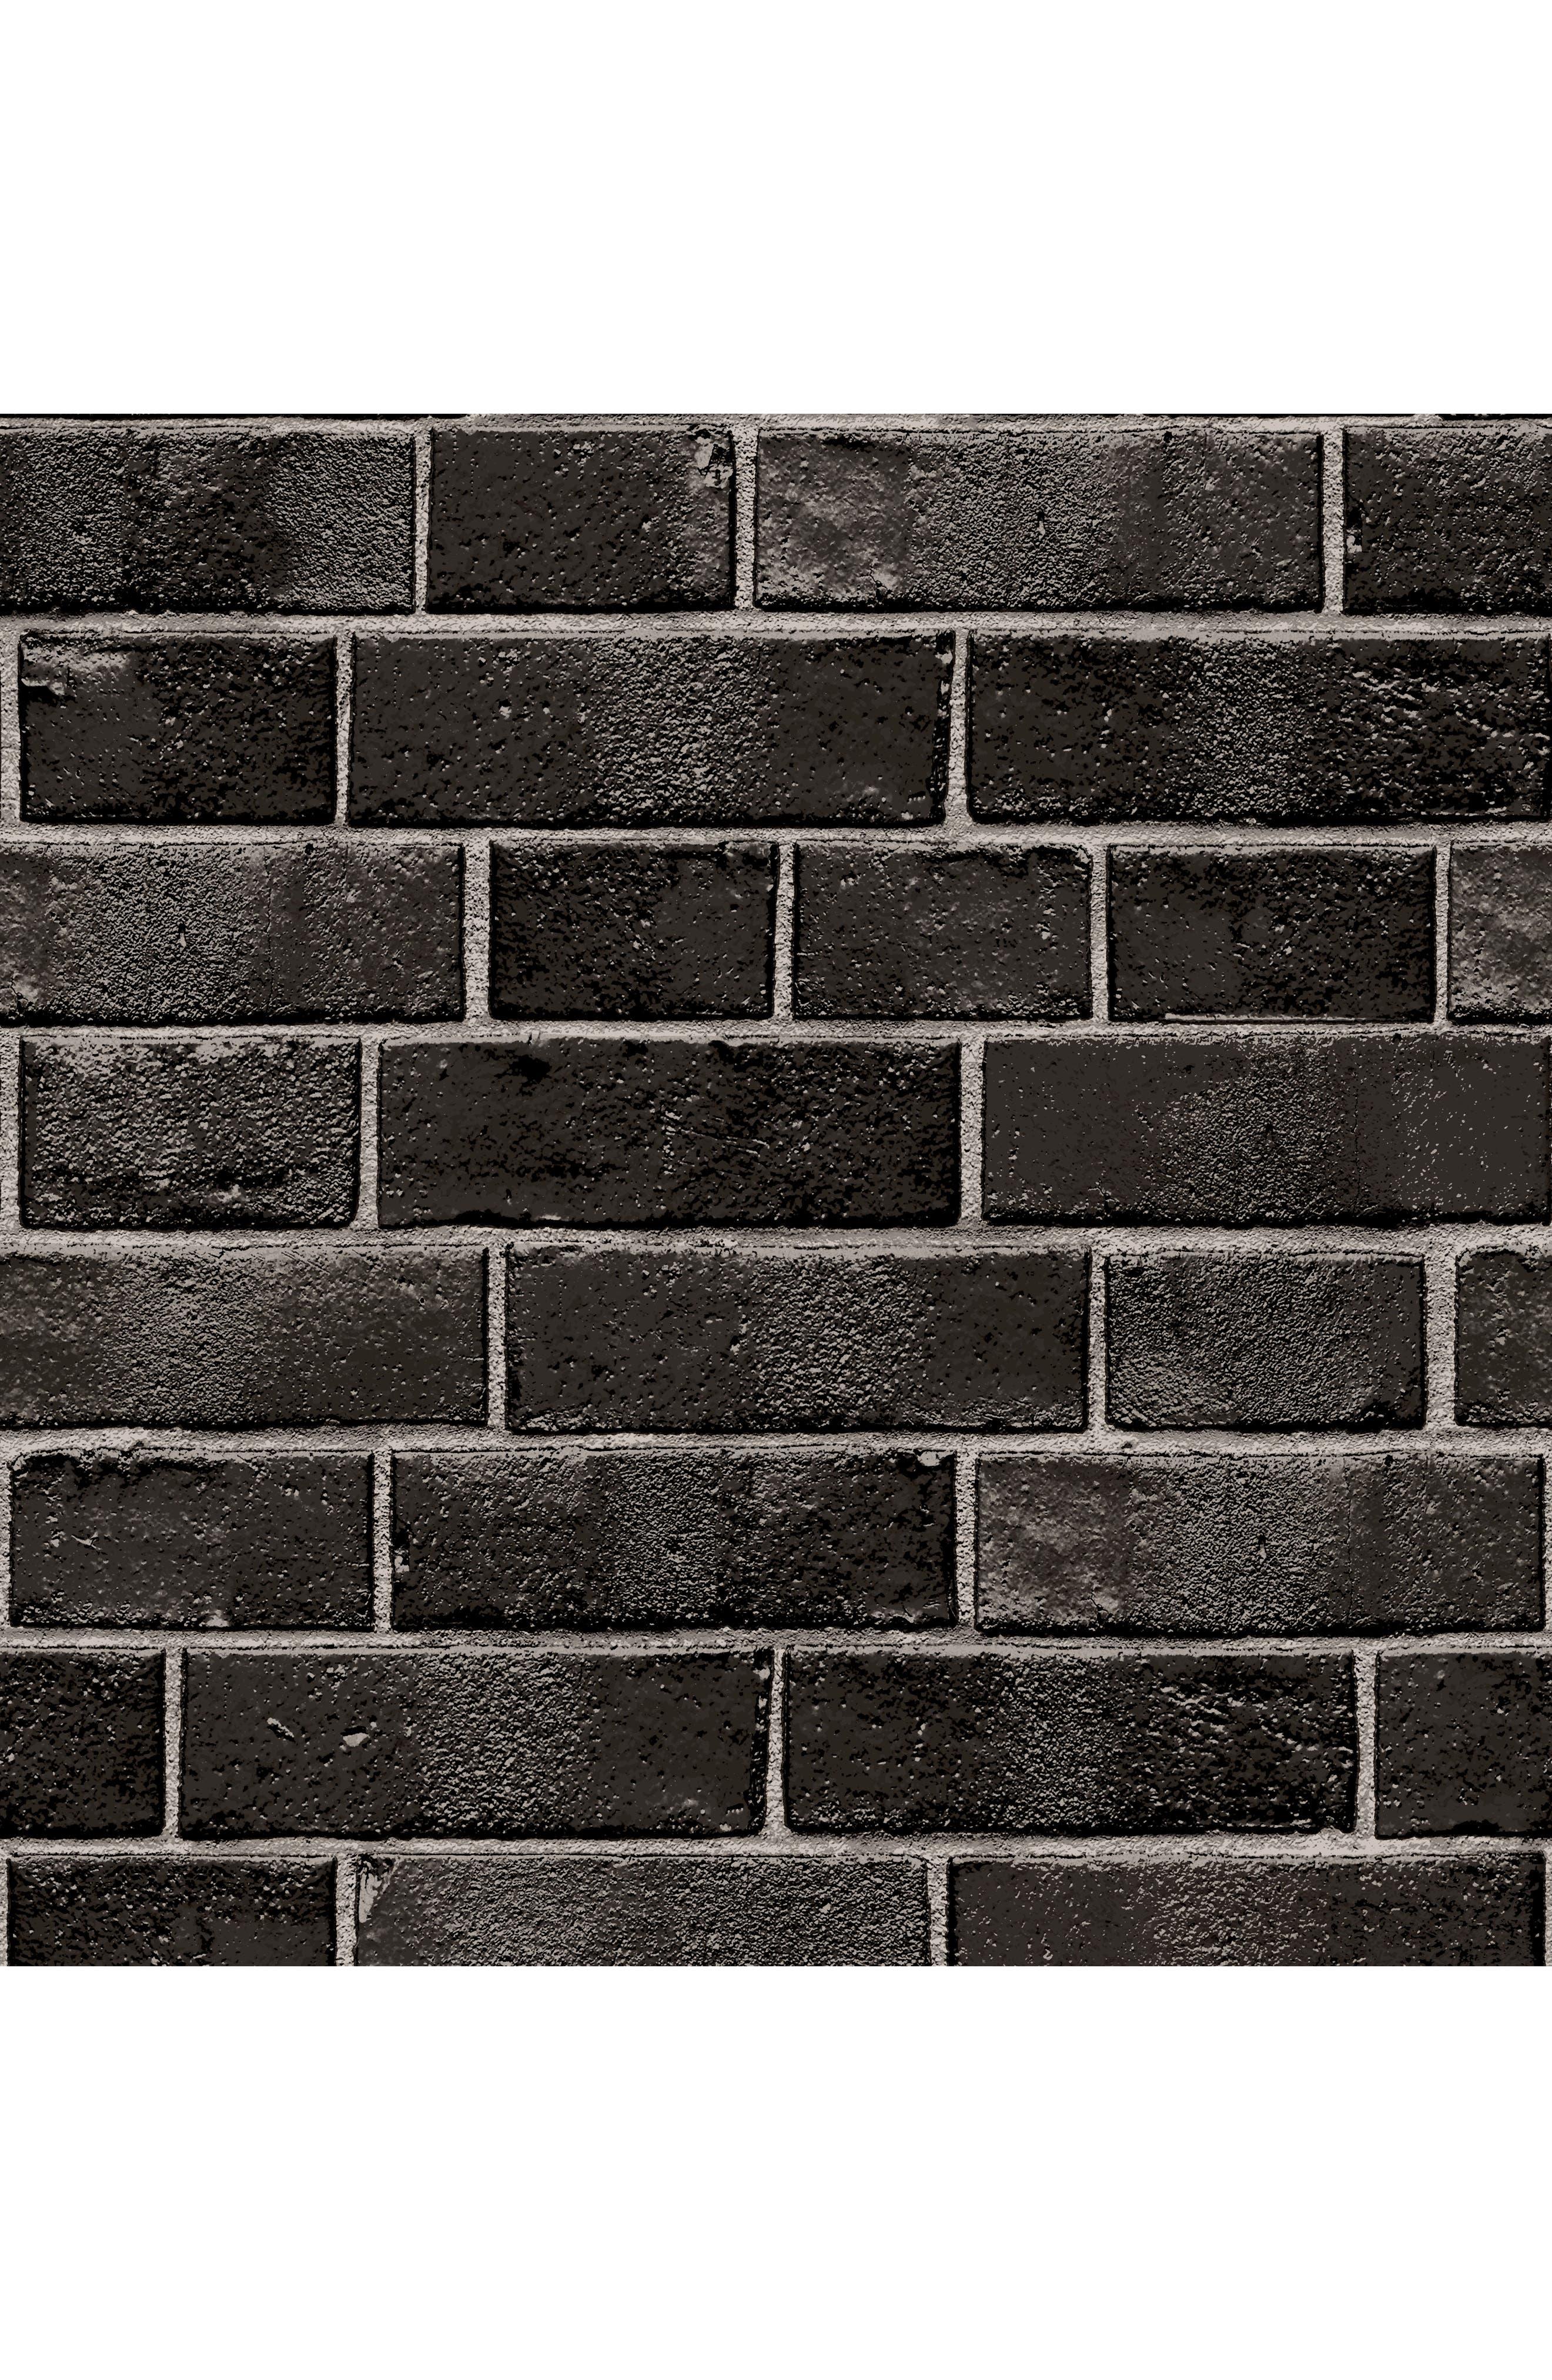 Brick Self-Adhesive Vinyl Wallpaper,                             Main thumbnail 1, color,                             001